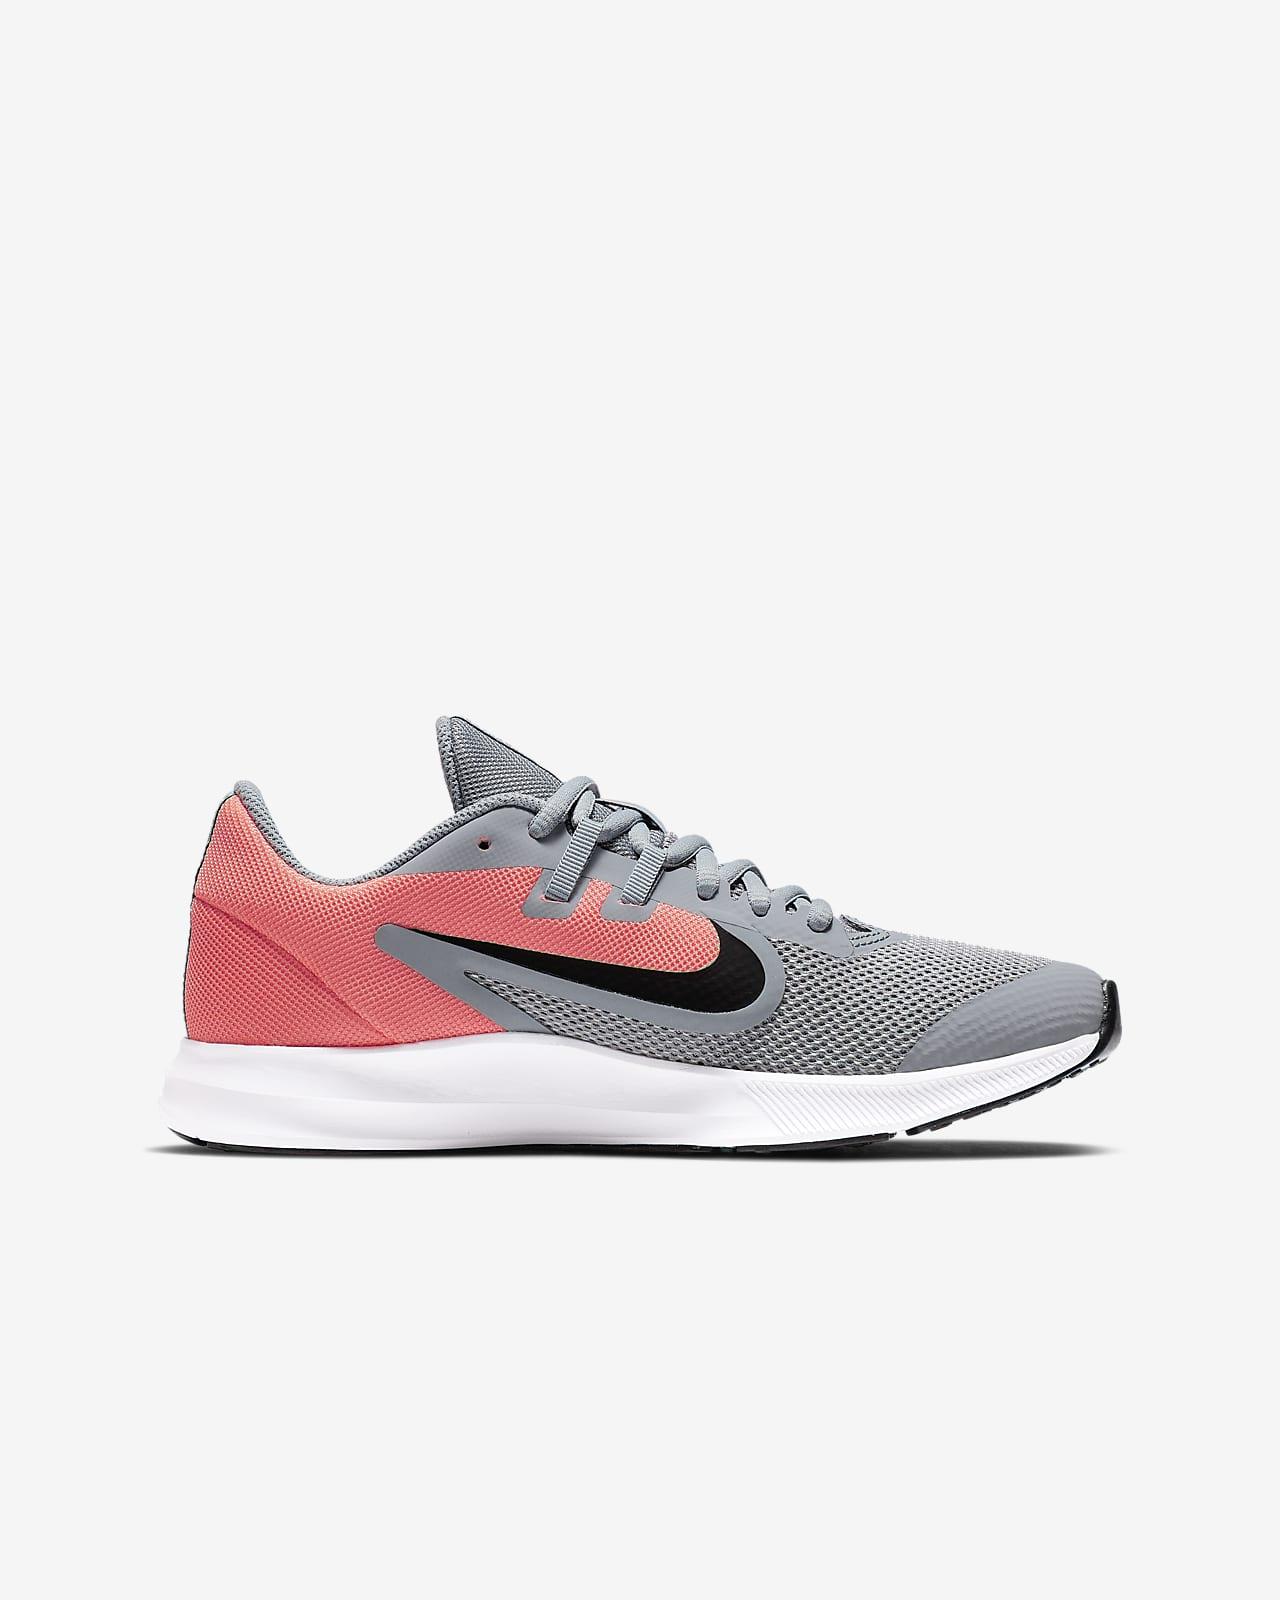 Nike Downshifter 9 Big Kids' Running